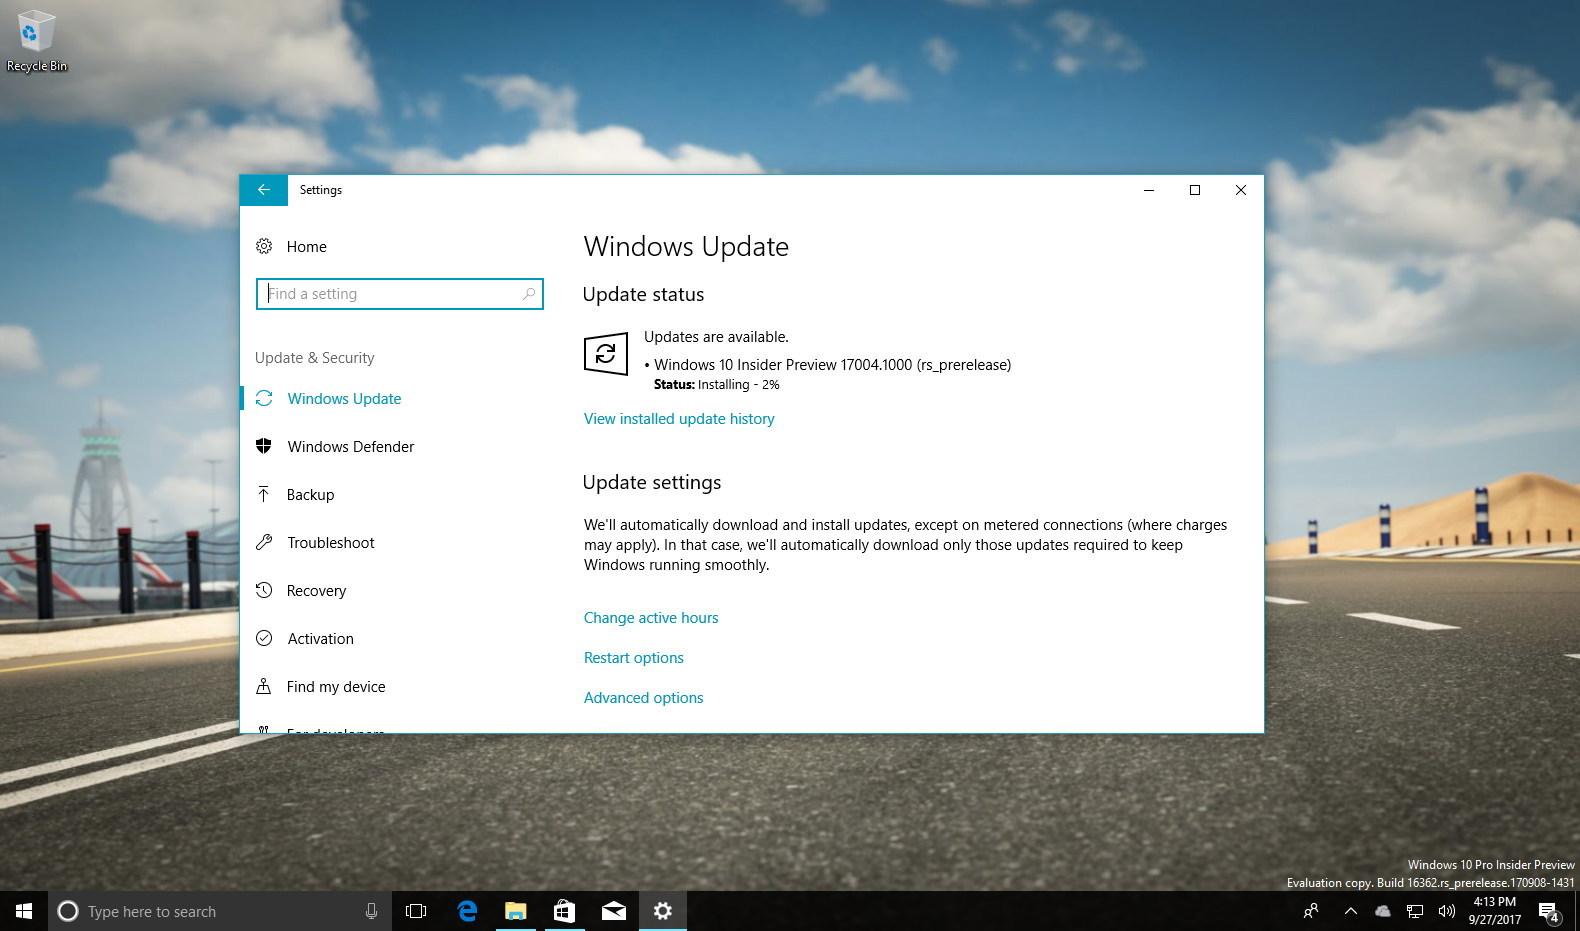 Windows 10 build 17004